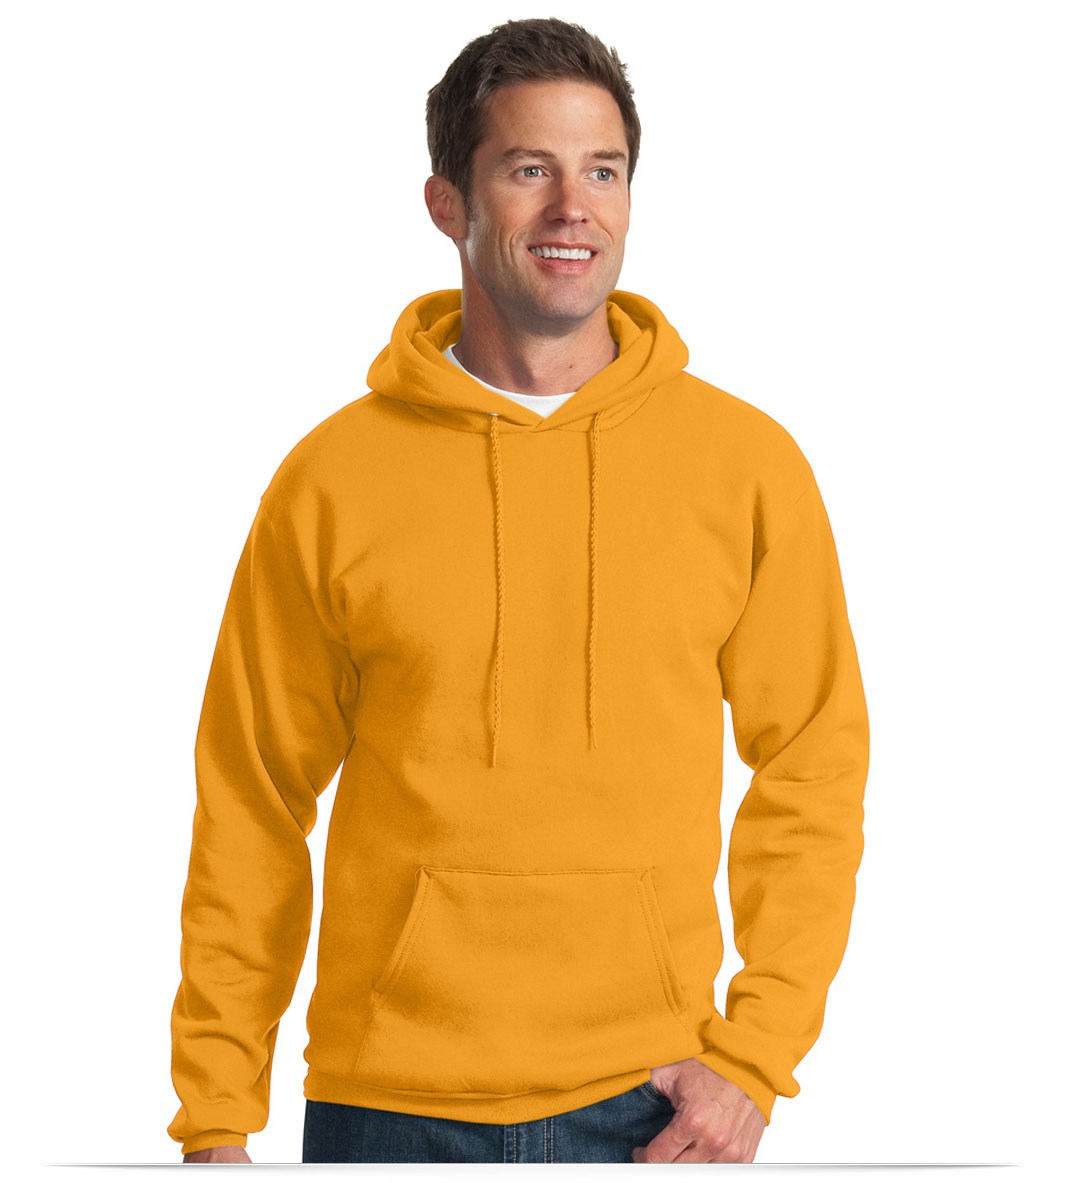 Custom Port and Company Tall Hooded Sweatshirt